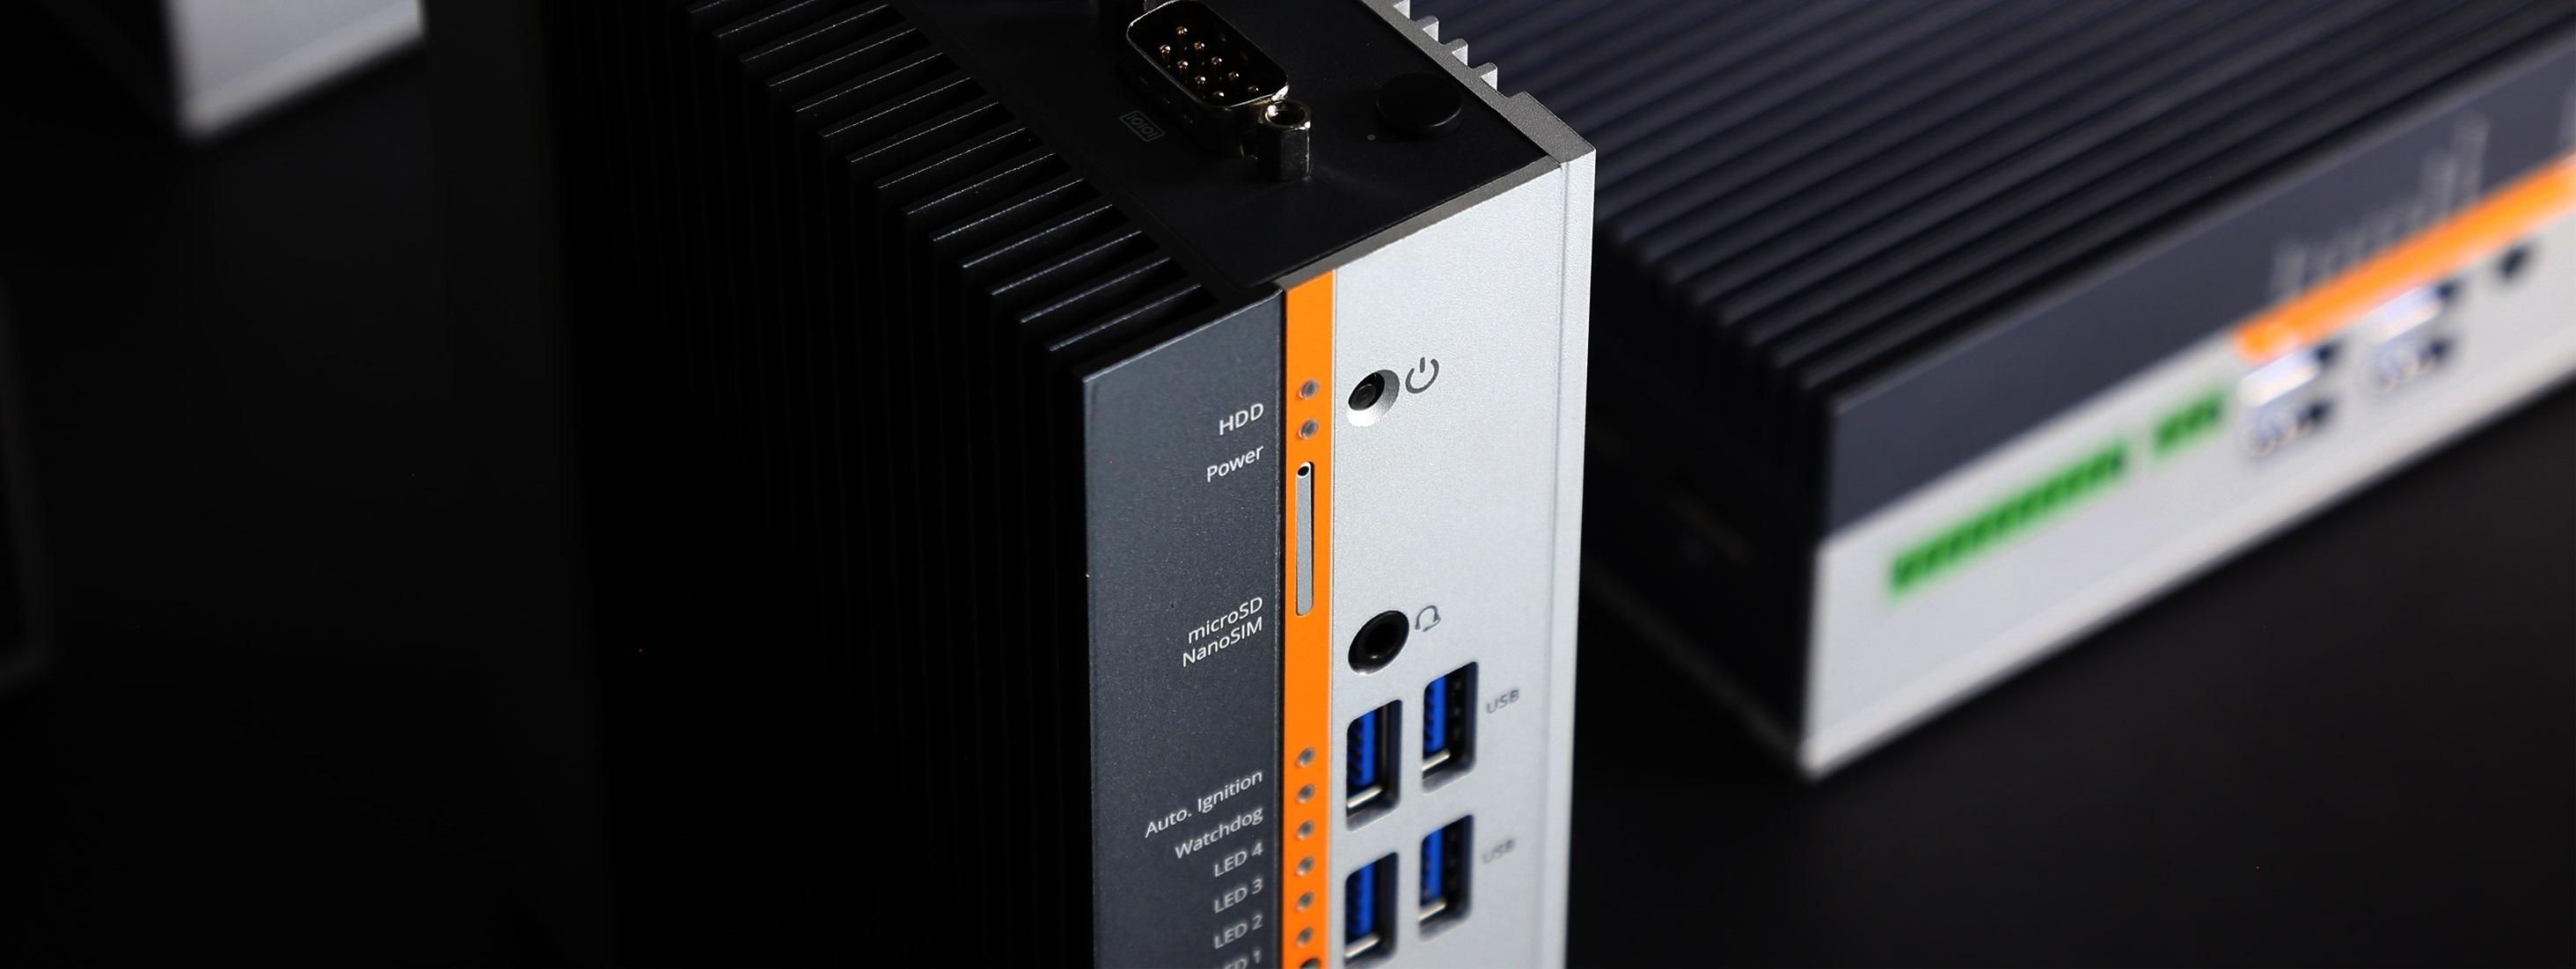 Why Use Rugged PCs At The Edge?